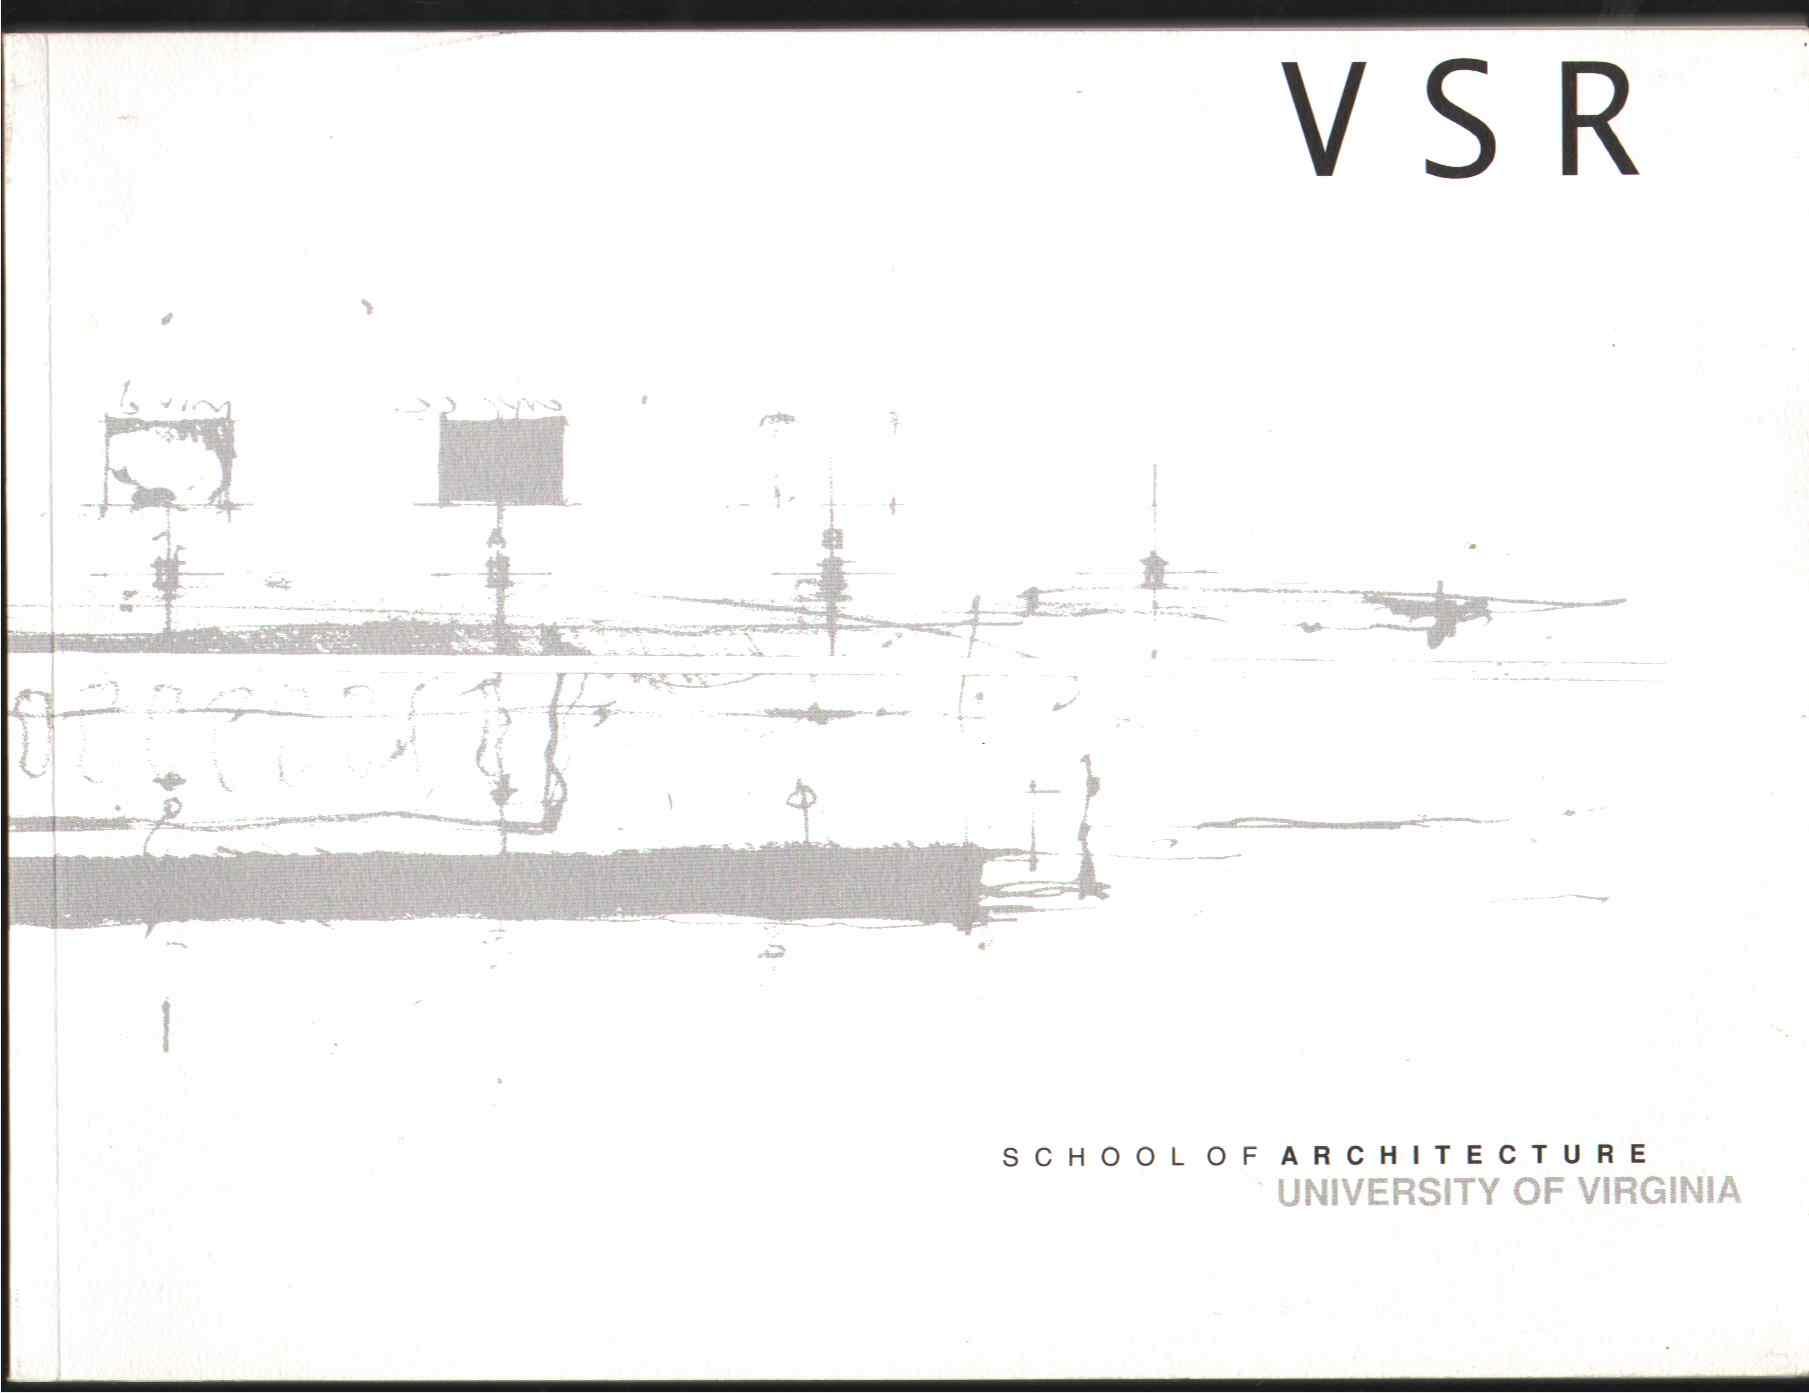 VIRGINIA STUDIO RECORD 1997-1998 Issue, School Of Architecture